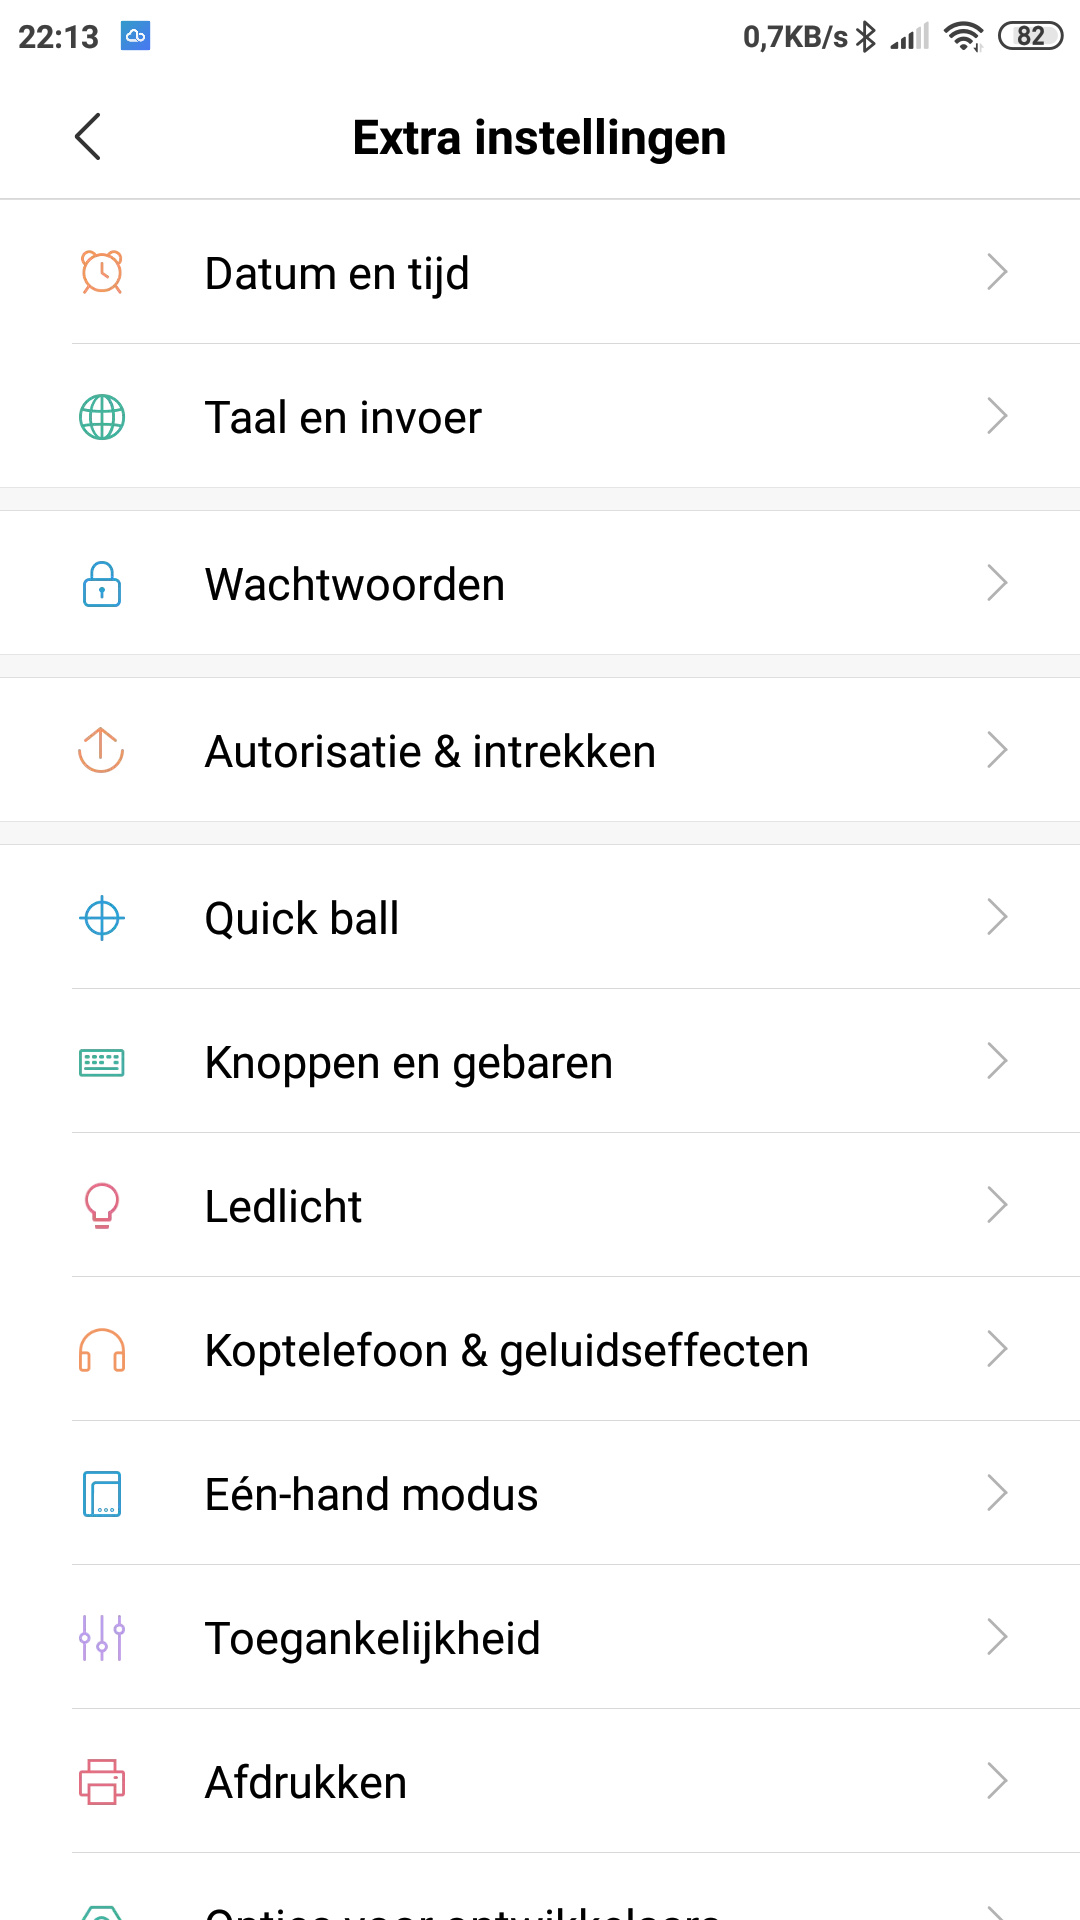 Screenshot_2018-12-22-22-13-33-164_com.android.settings.png